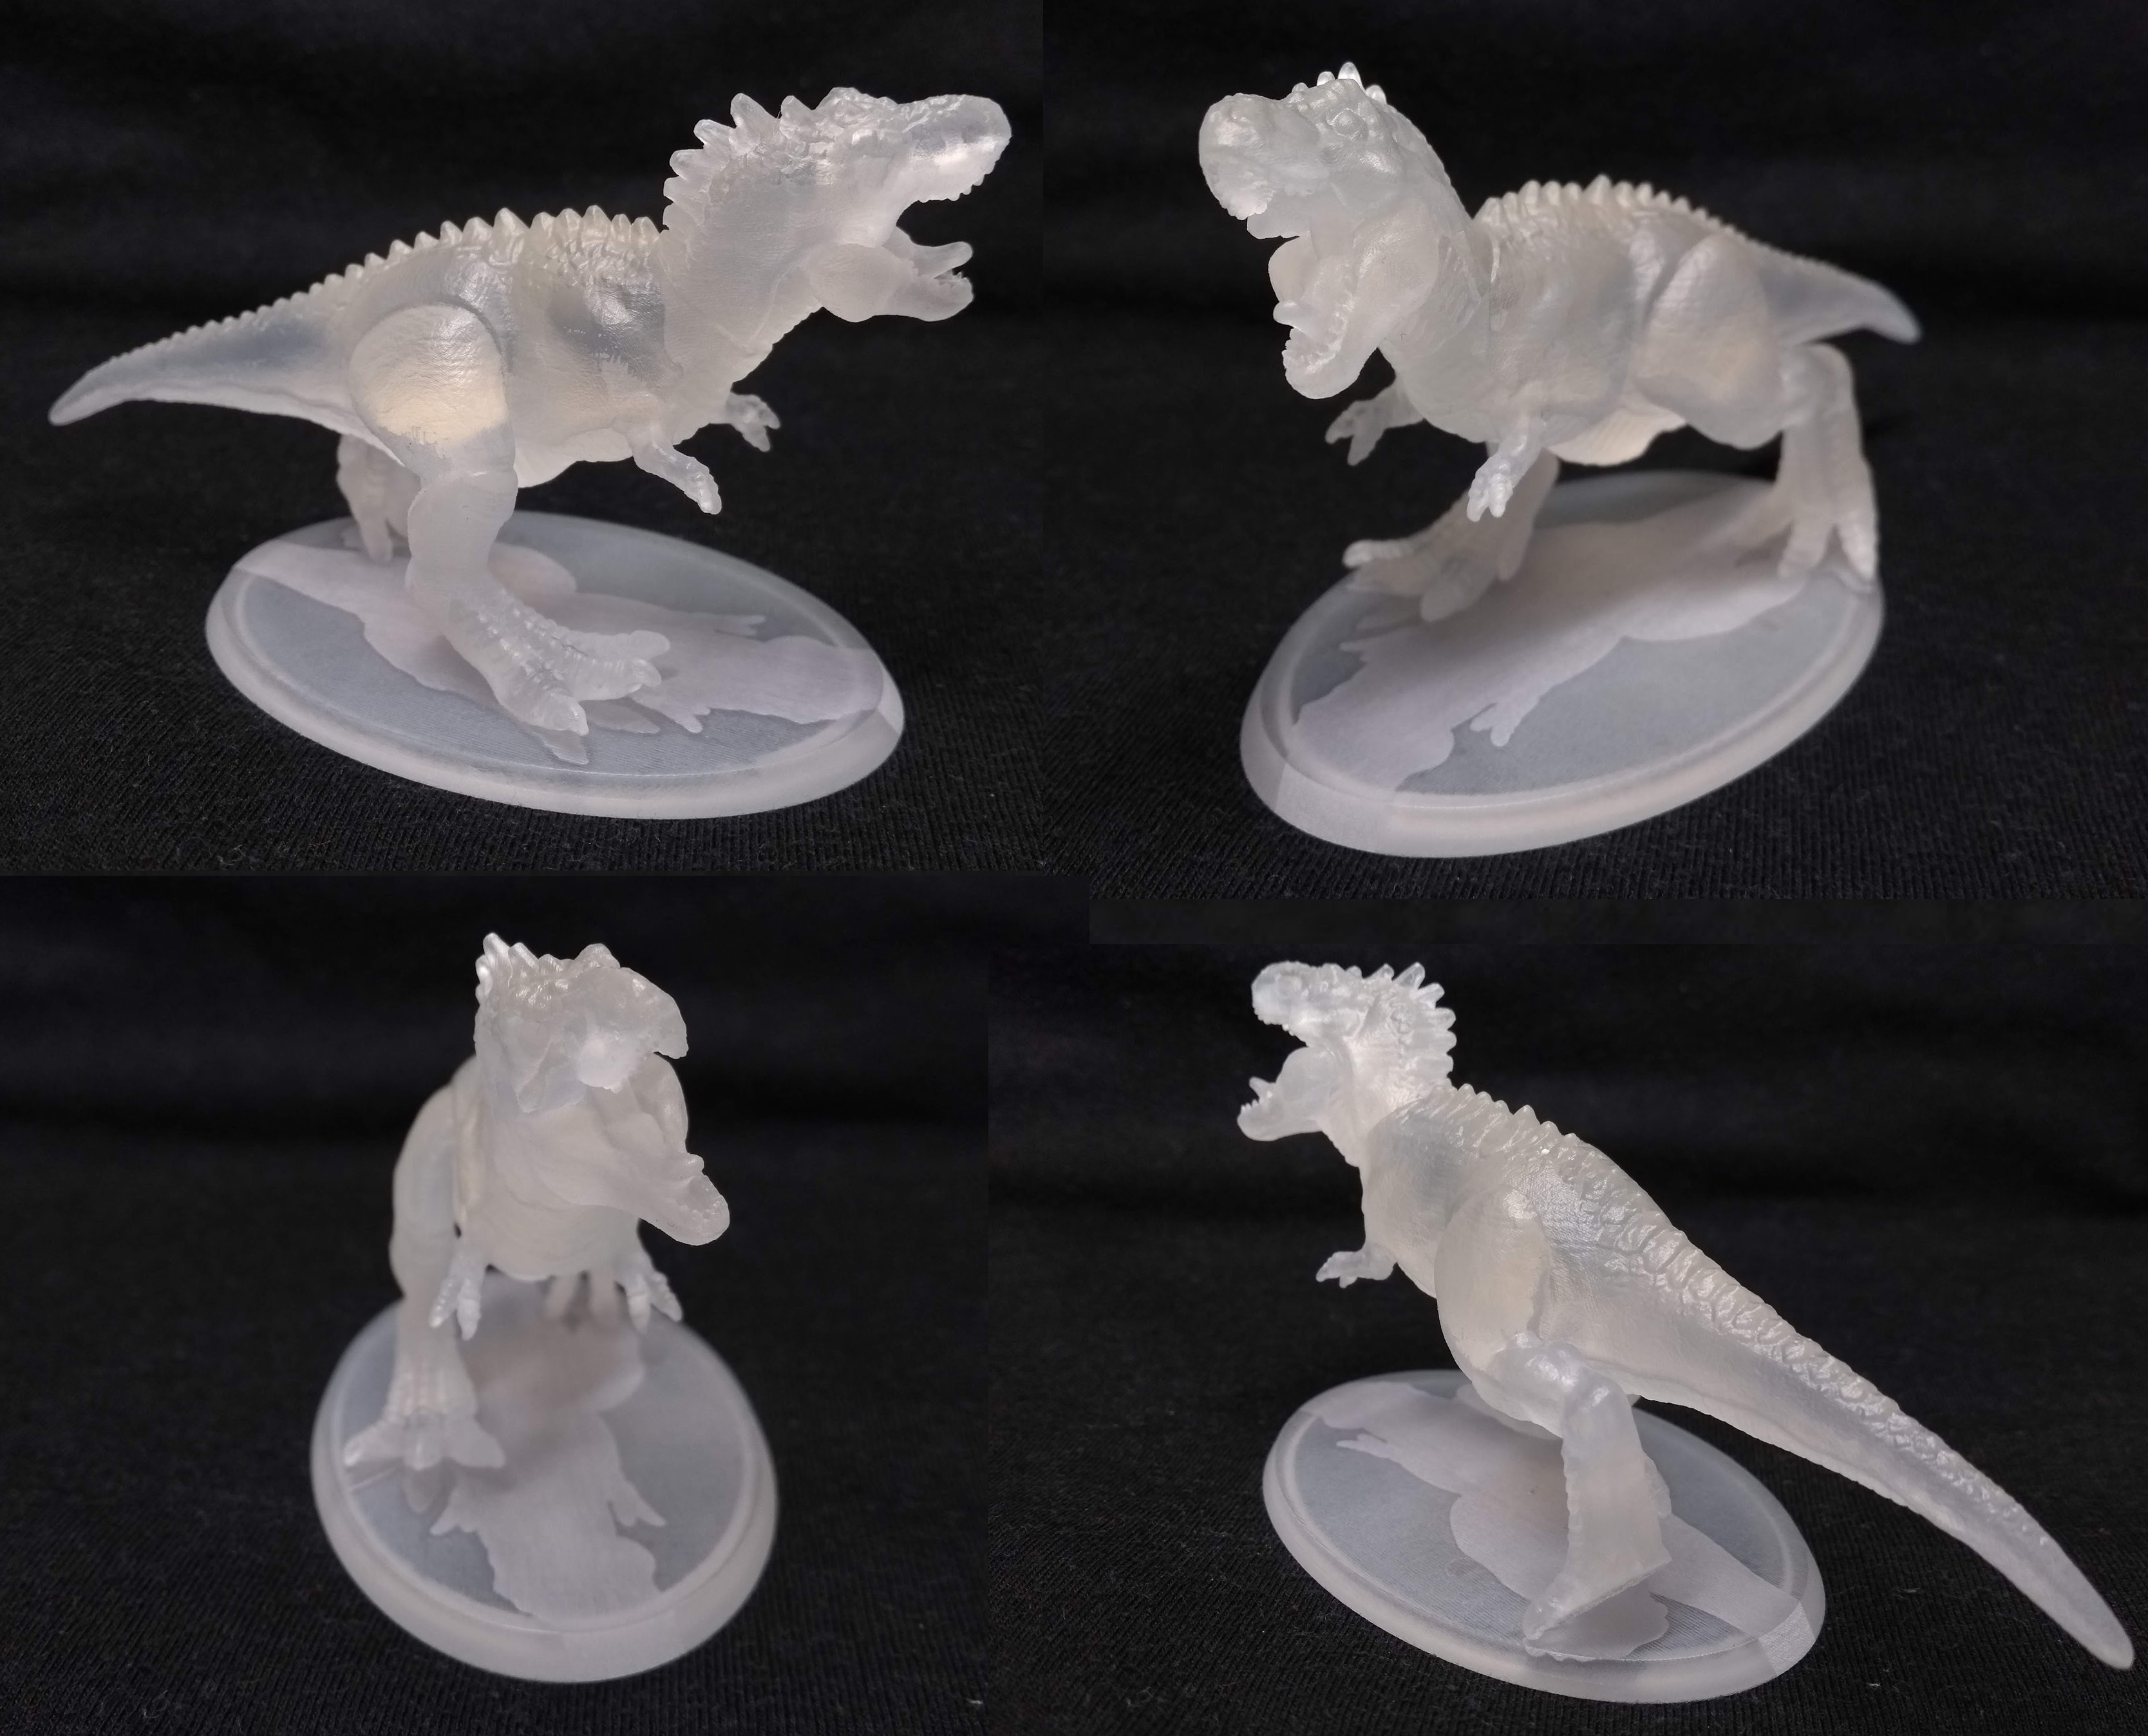 T-Rex 3D Print